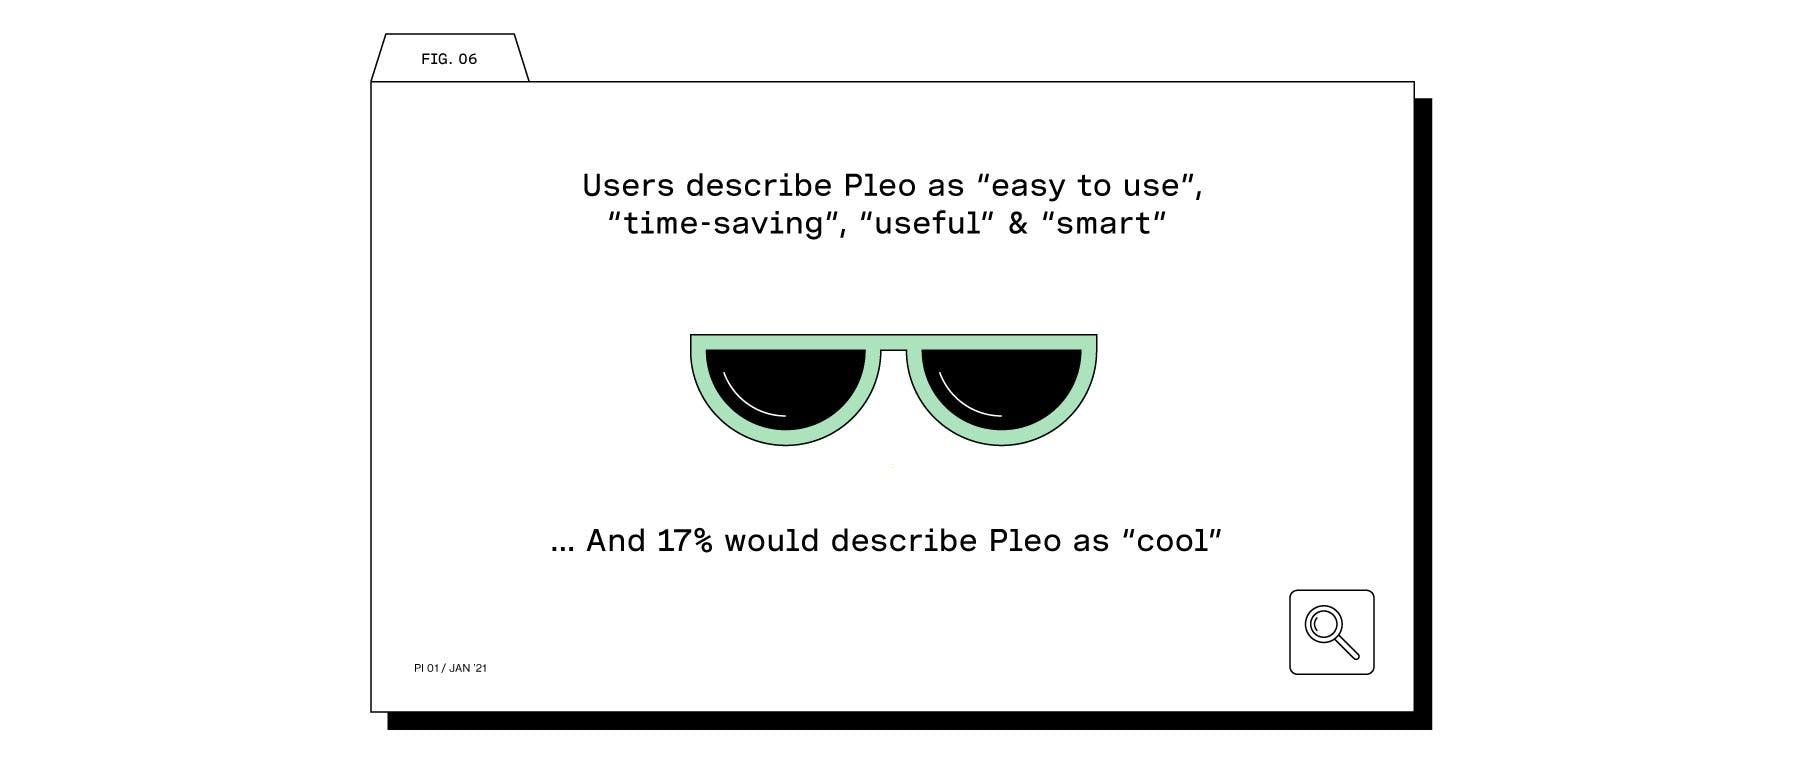 Easy to use, time-saving, useful, smart AND cool